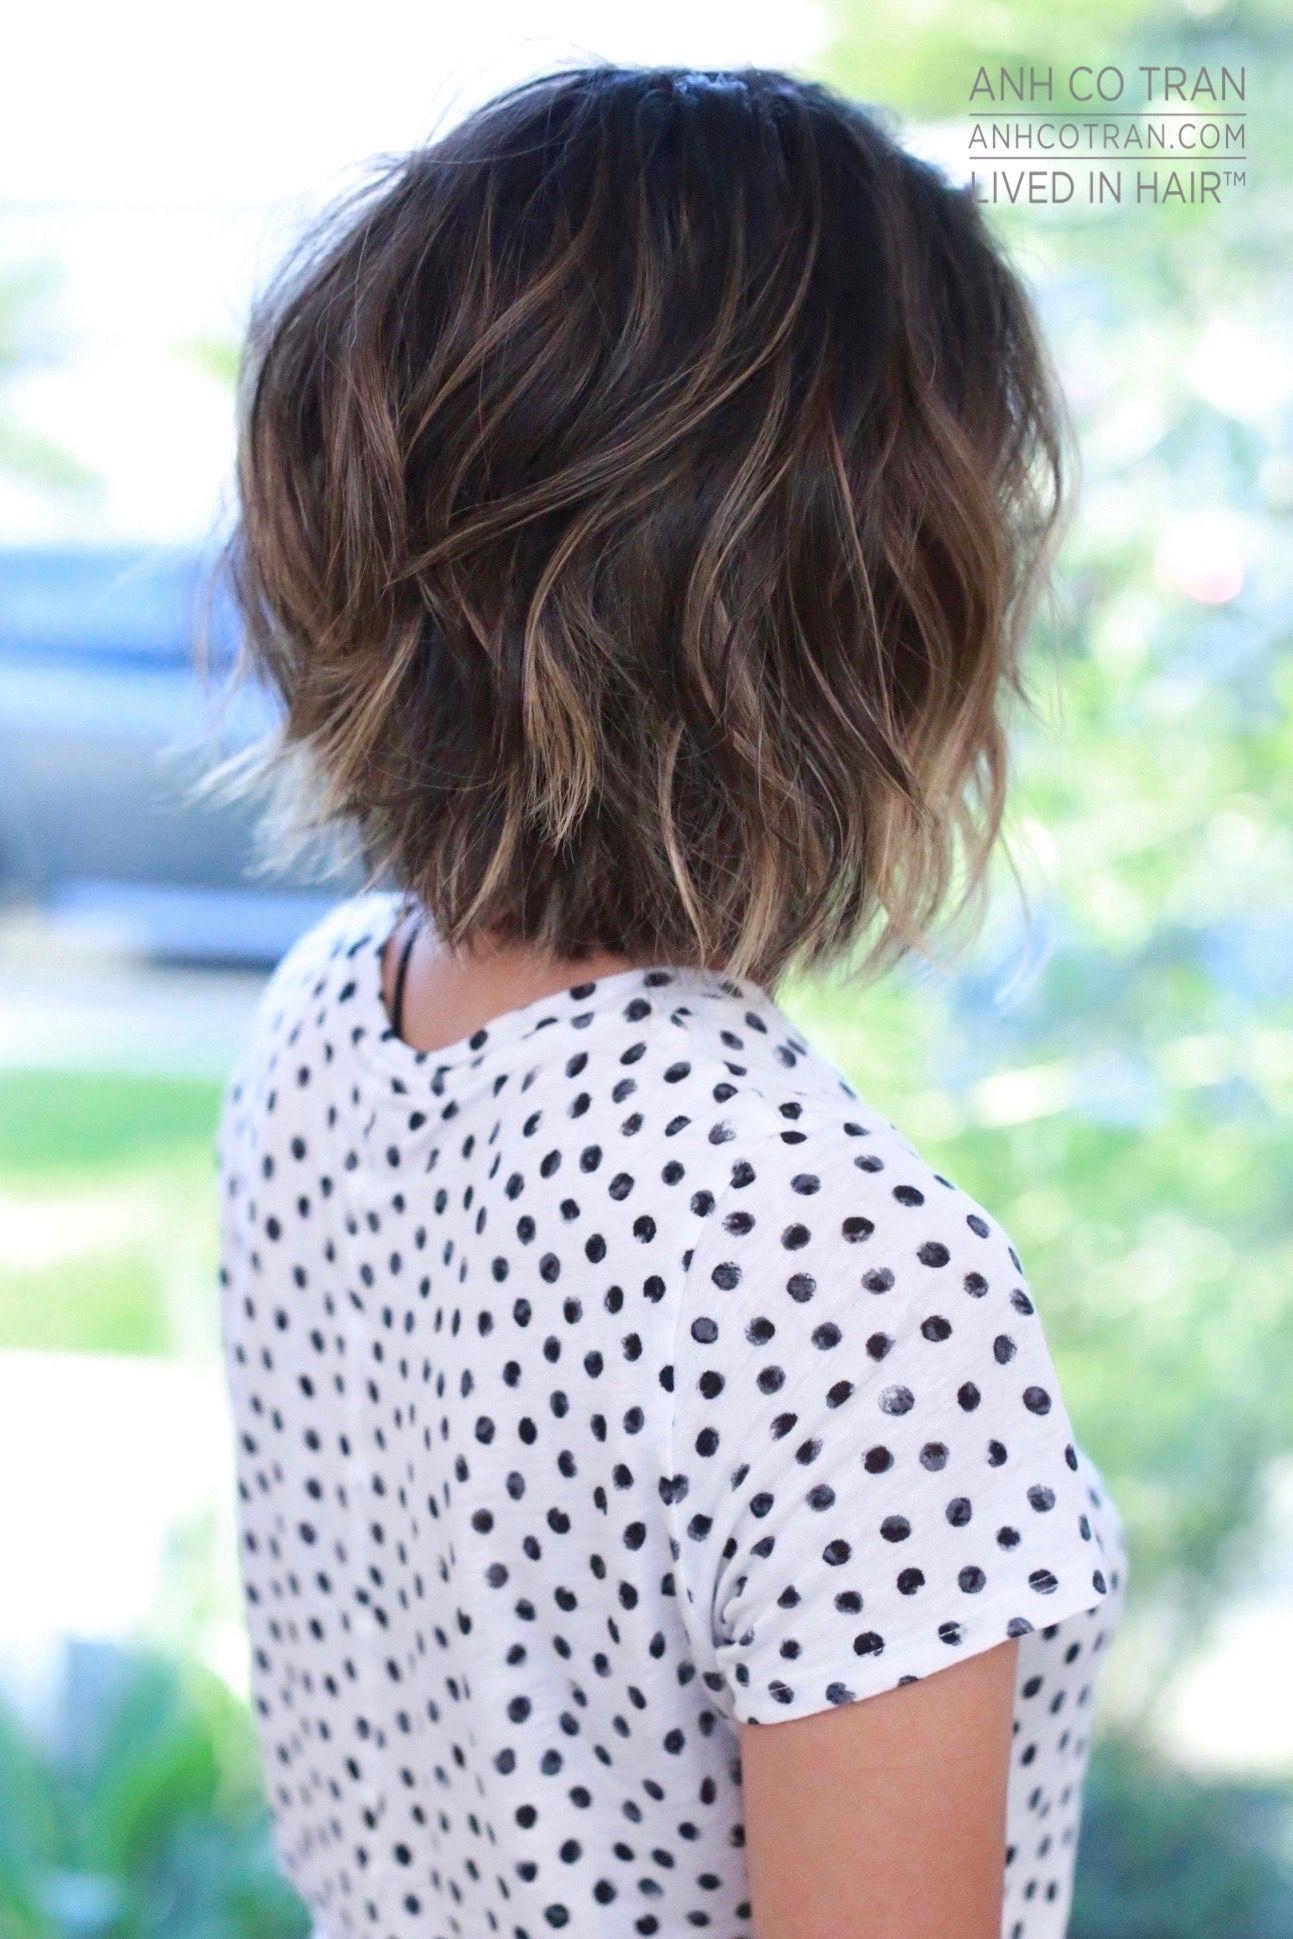 Anh co tran more hair pinterest hair style haircuts and hair cuts